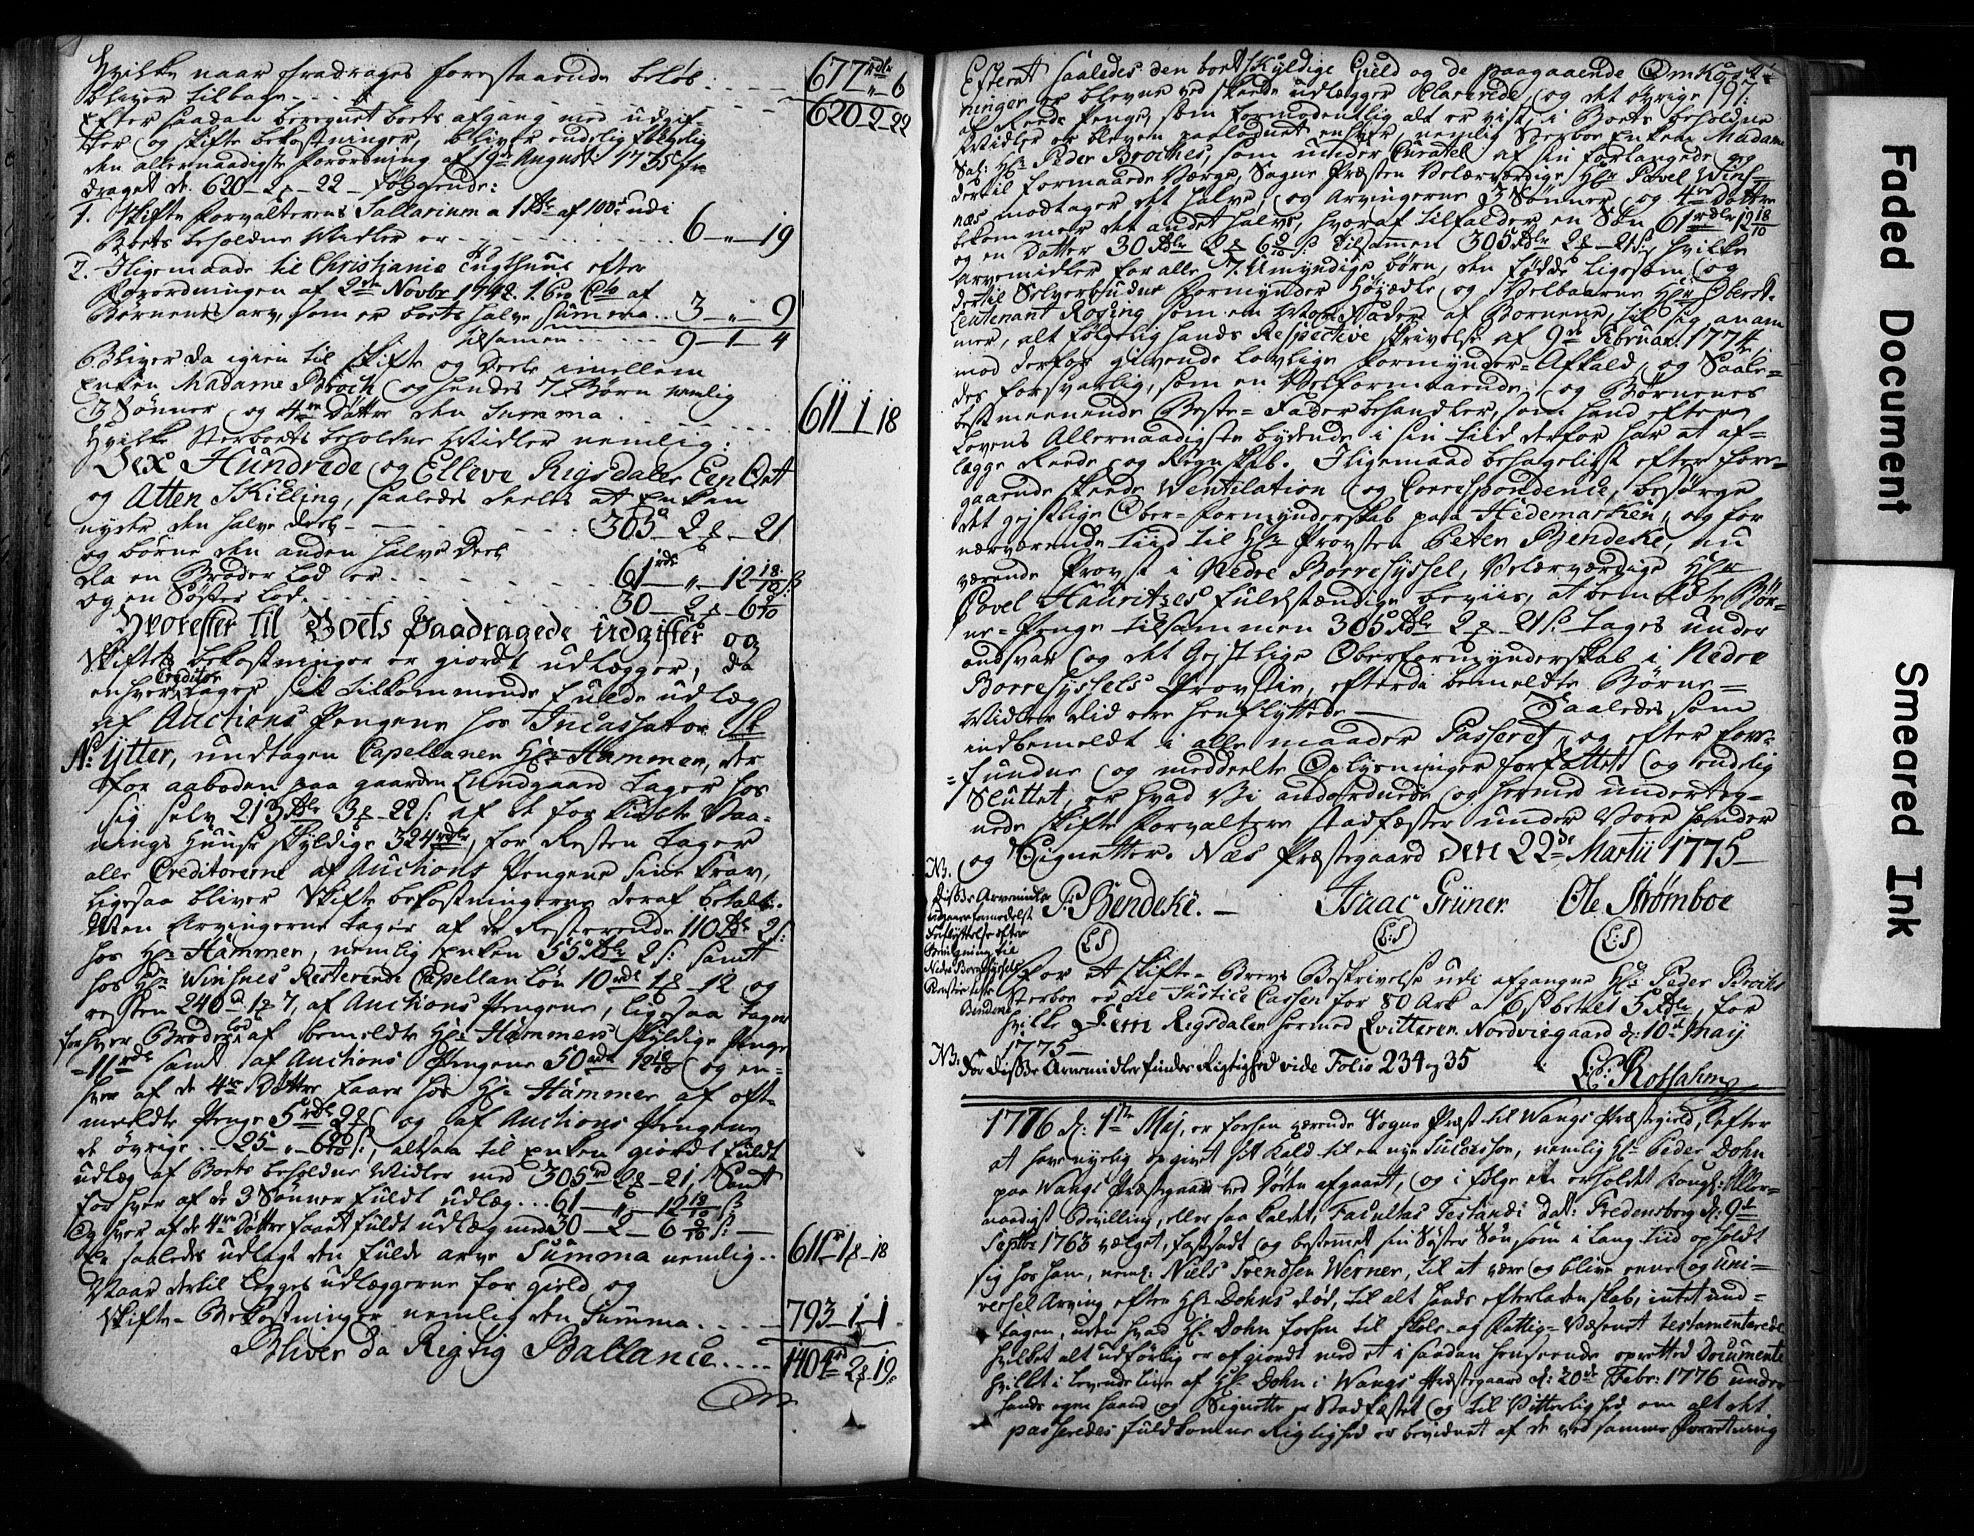 SAH, Hedmark prosti, 1749-1809, s. 196b-197a